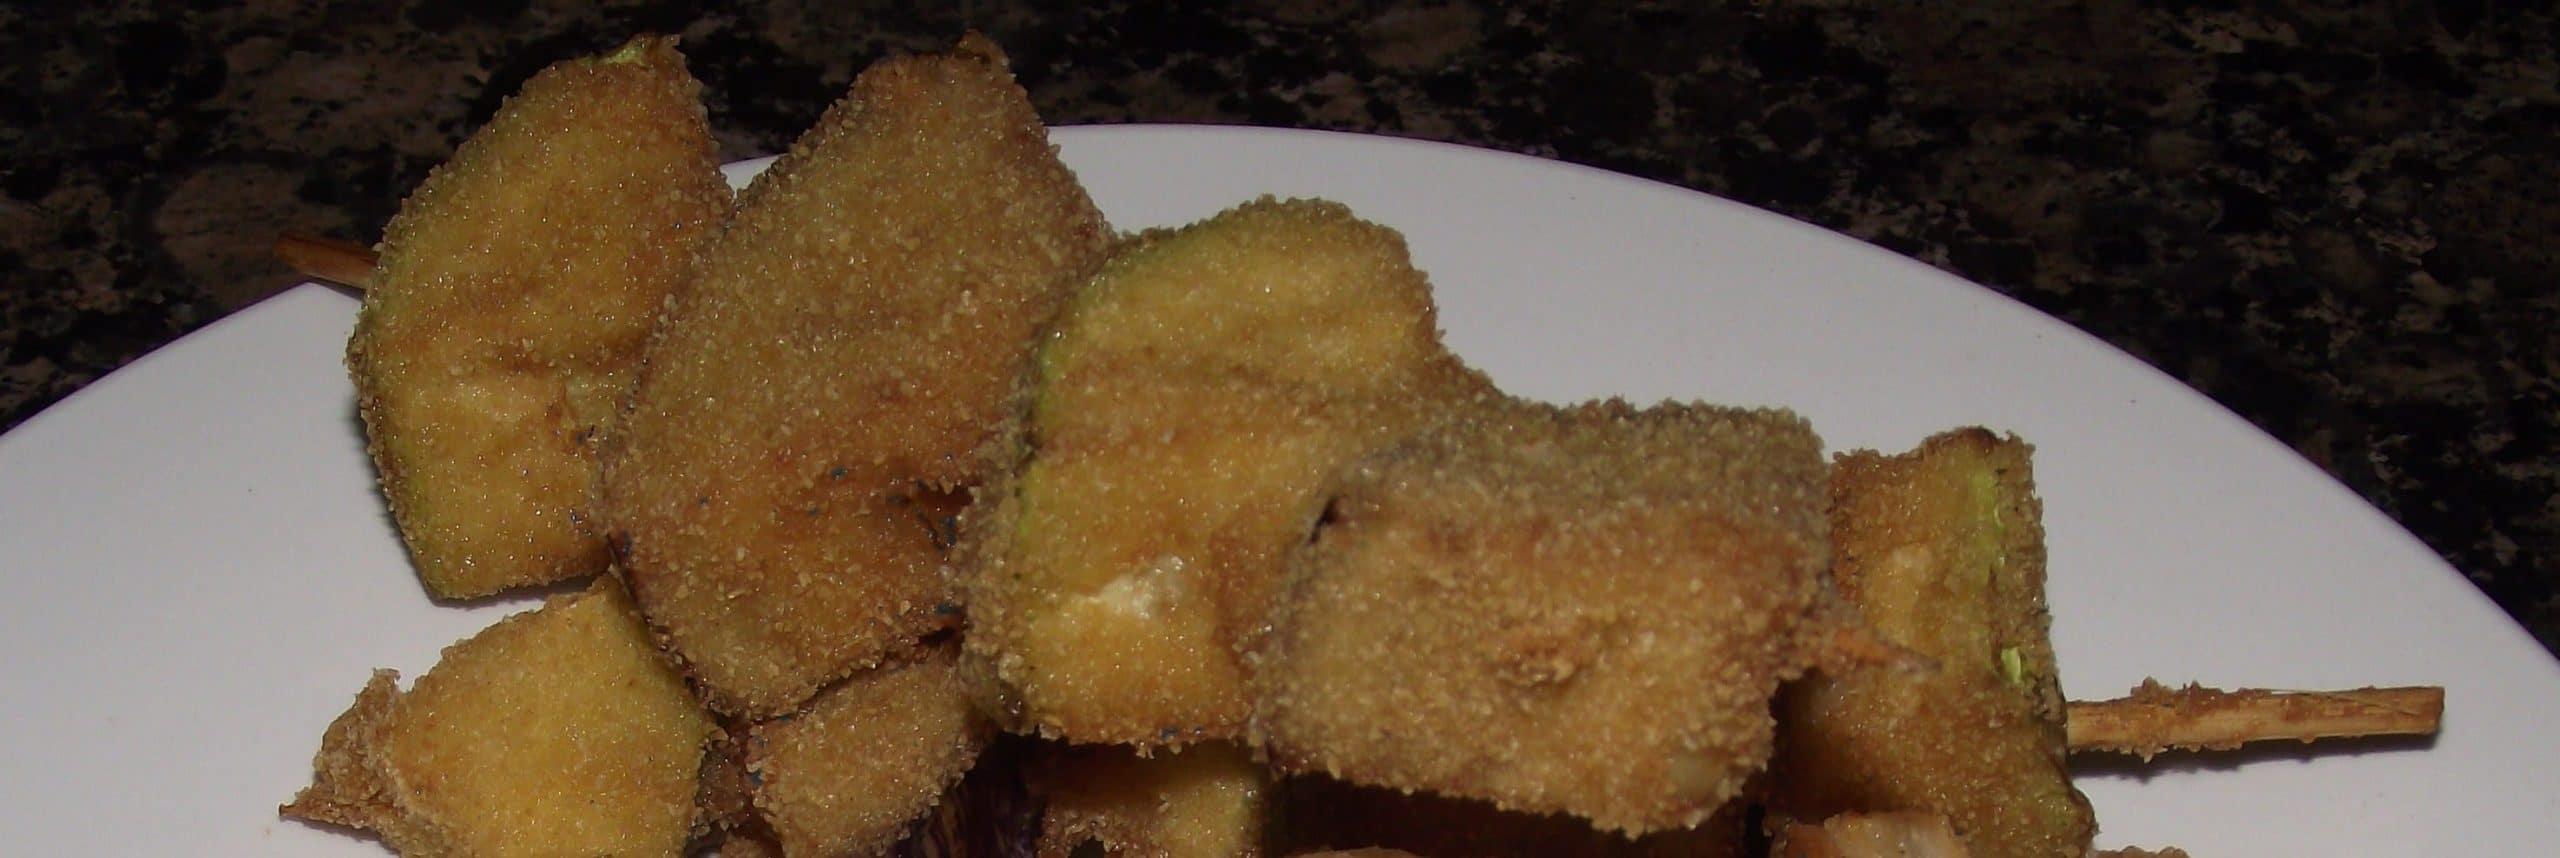 brocheta a base de verdura: calabacin y berenjena